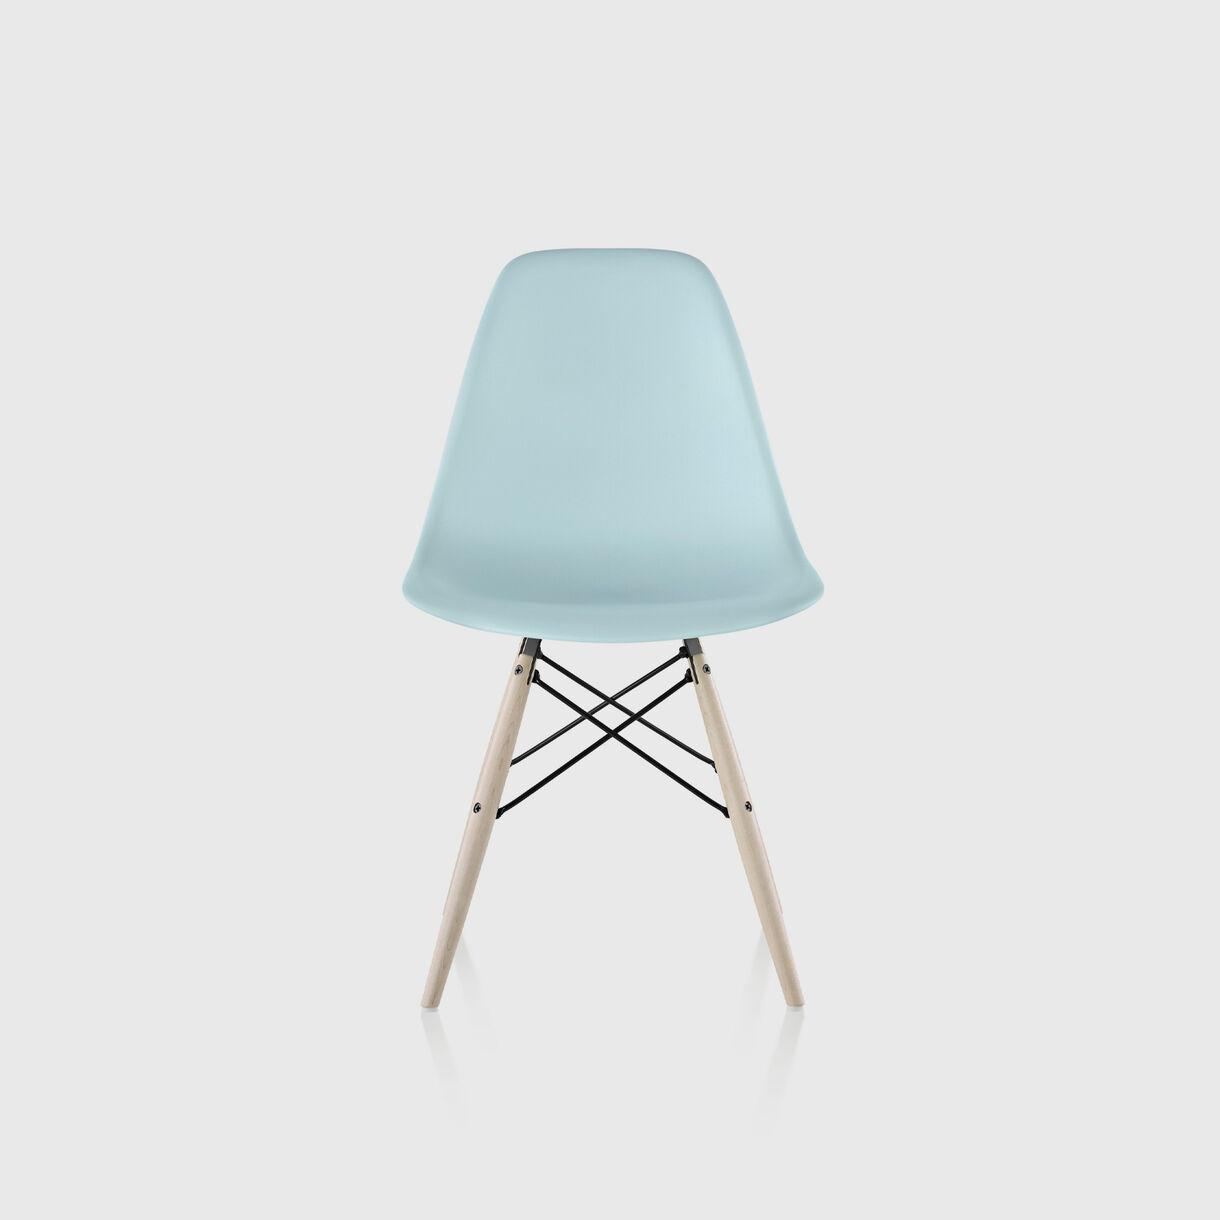 Eames Moulded Plastic Side Chair, Dowel, Aqua Sky & White Ash